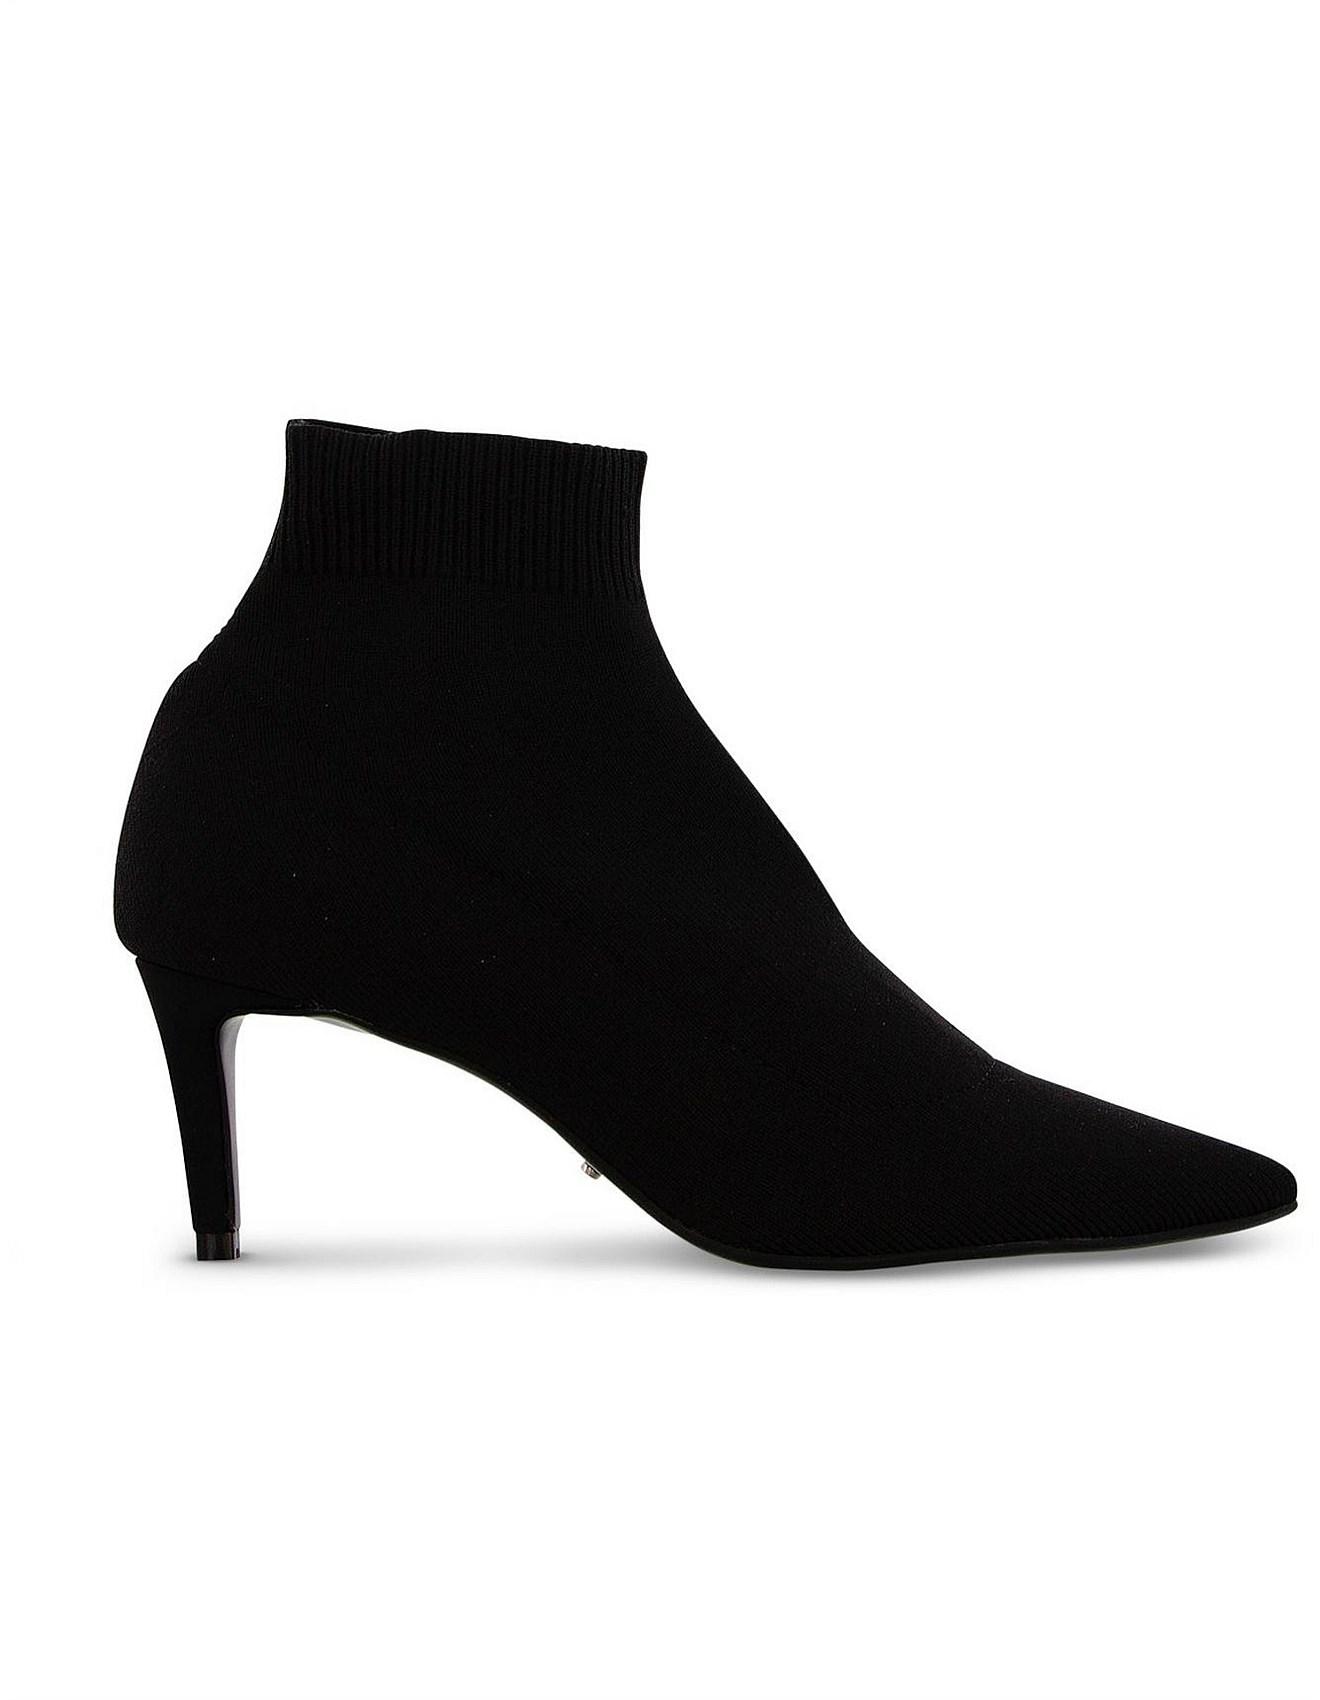 c4f7e8c55061b8 Tony Bianco   Tony Bianco Boots, Shoes & More   David Jones - Gwen Boot